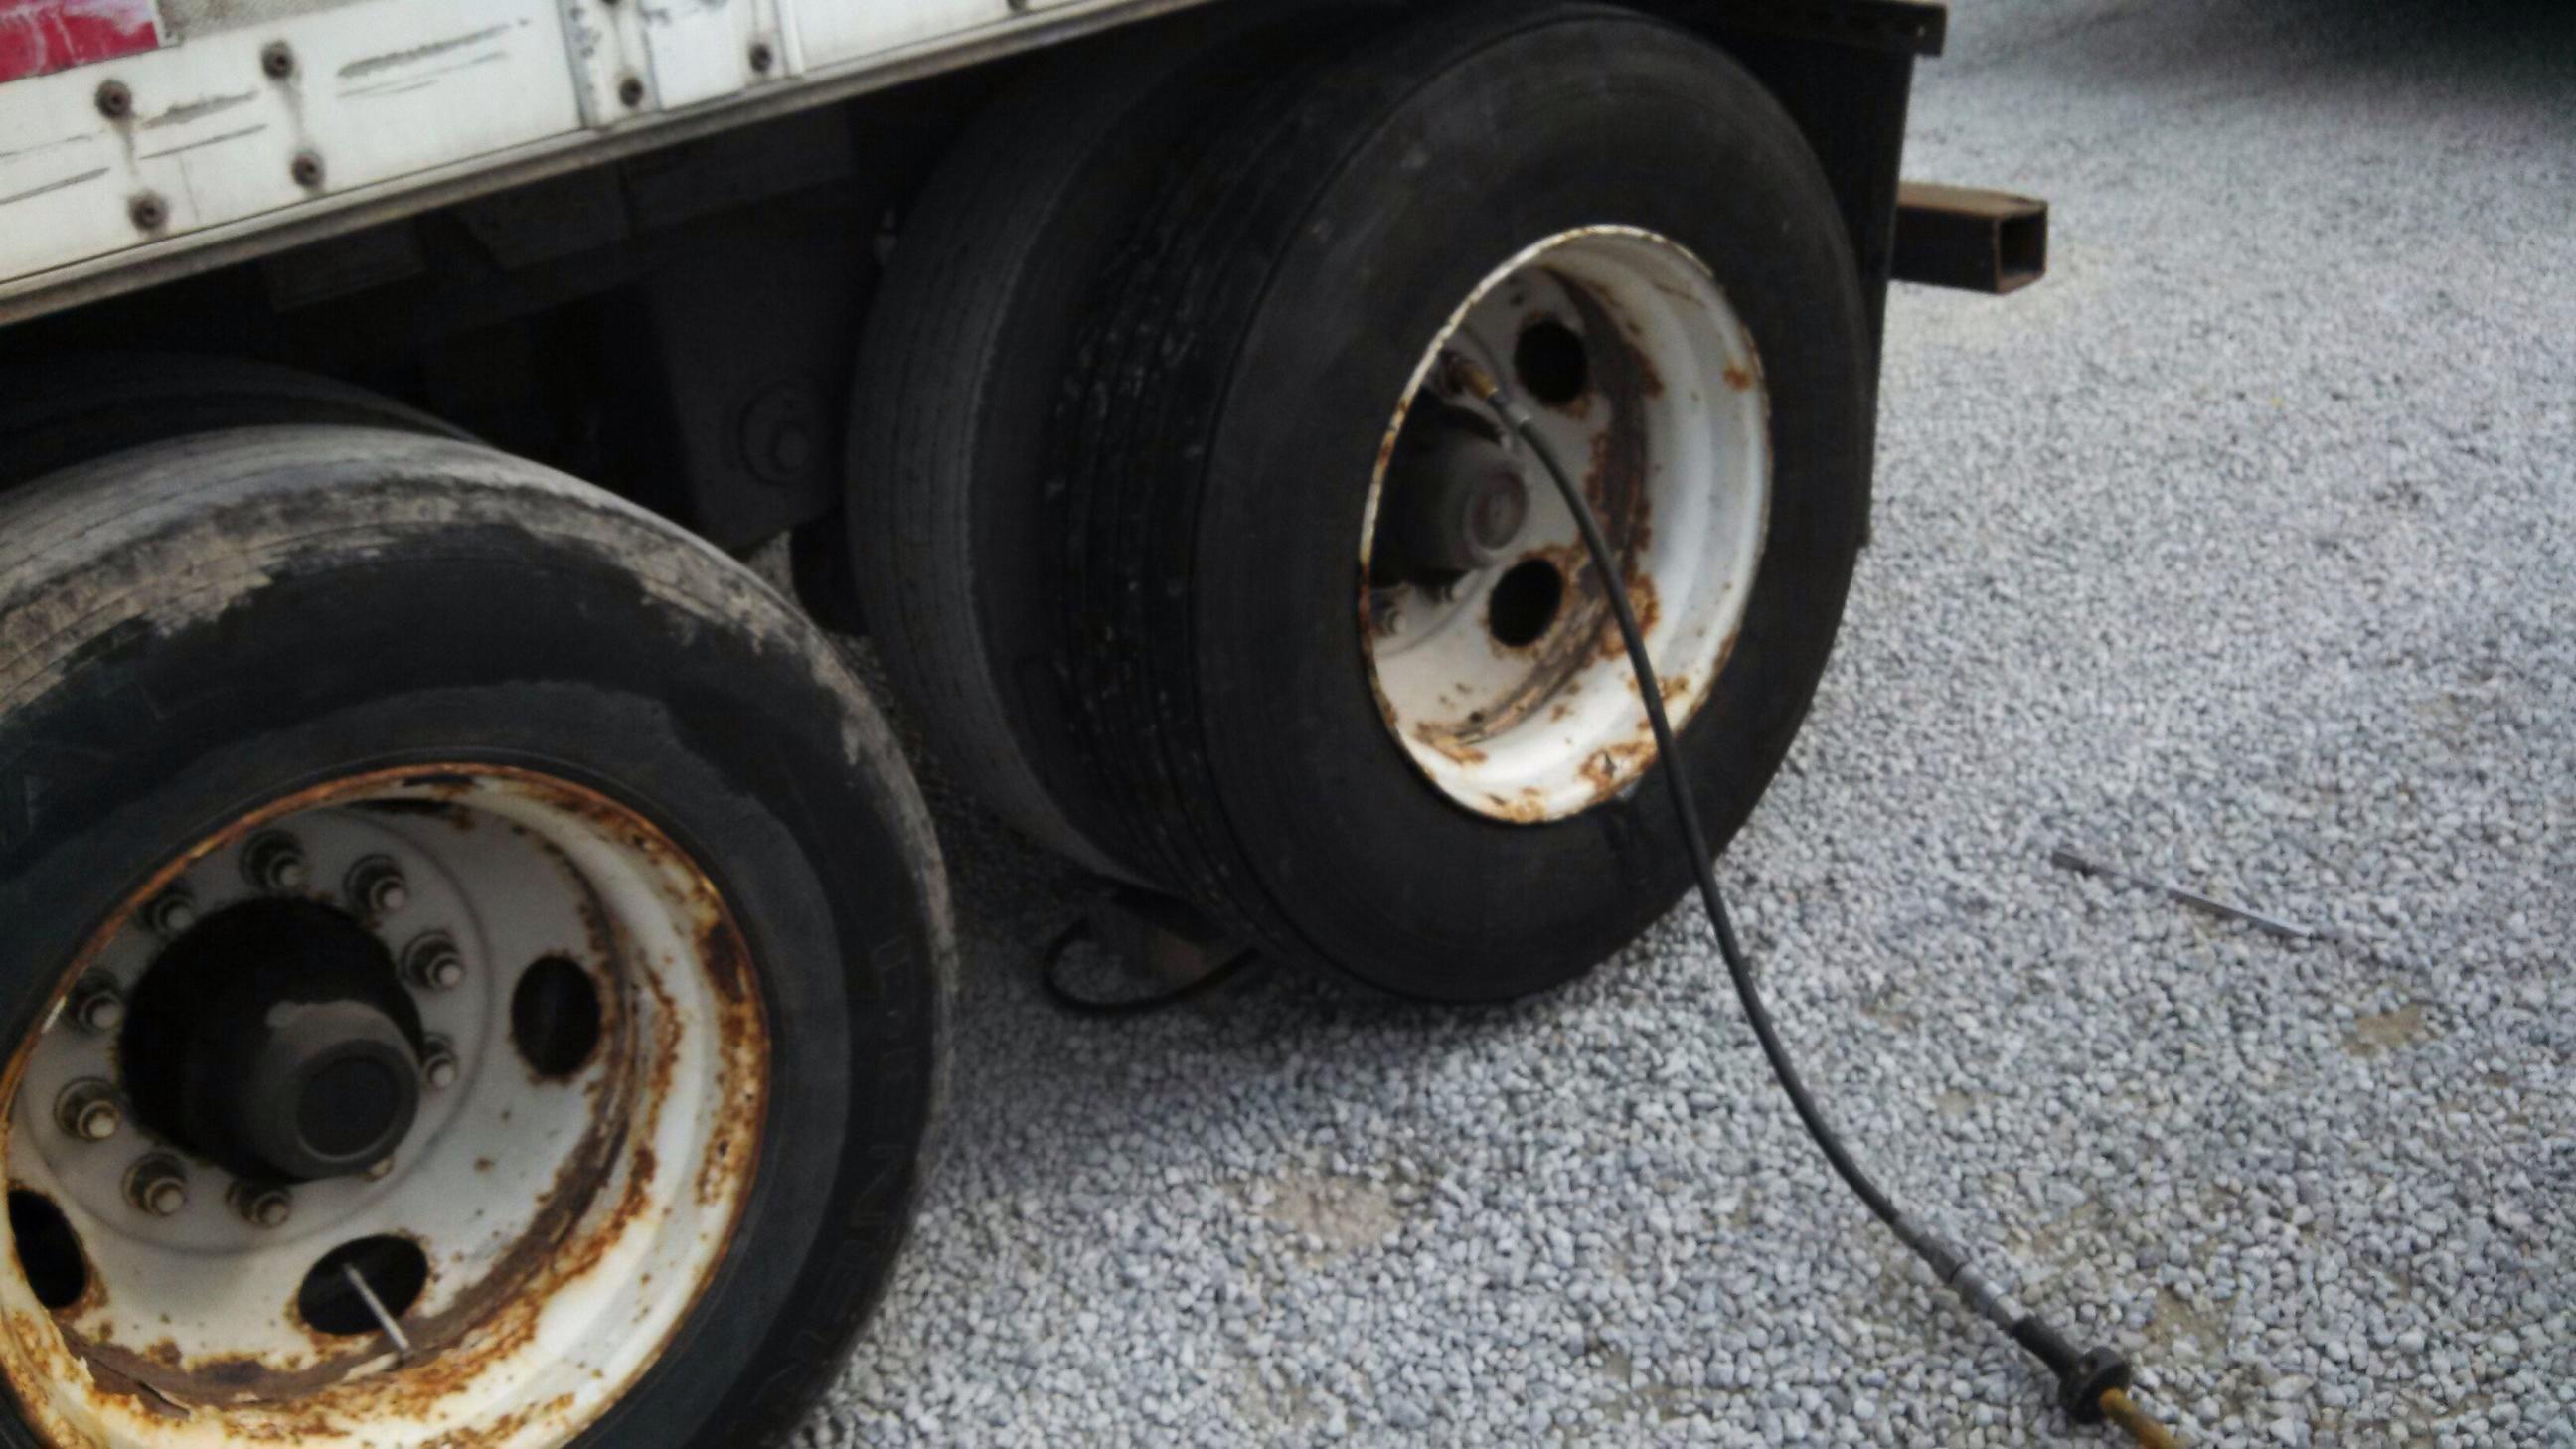 Effingham Tire Repair Now fers Emergency Roadside Tire Assistance